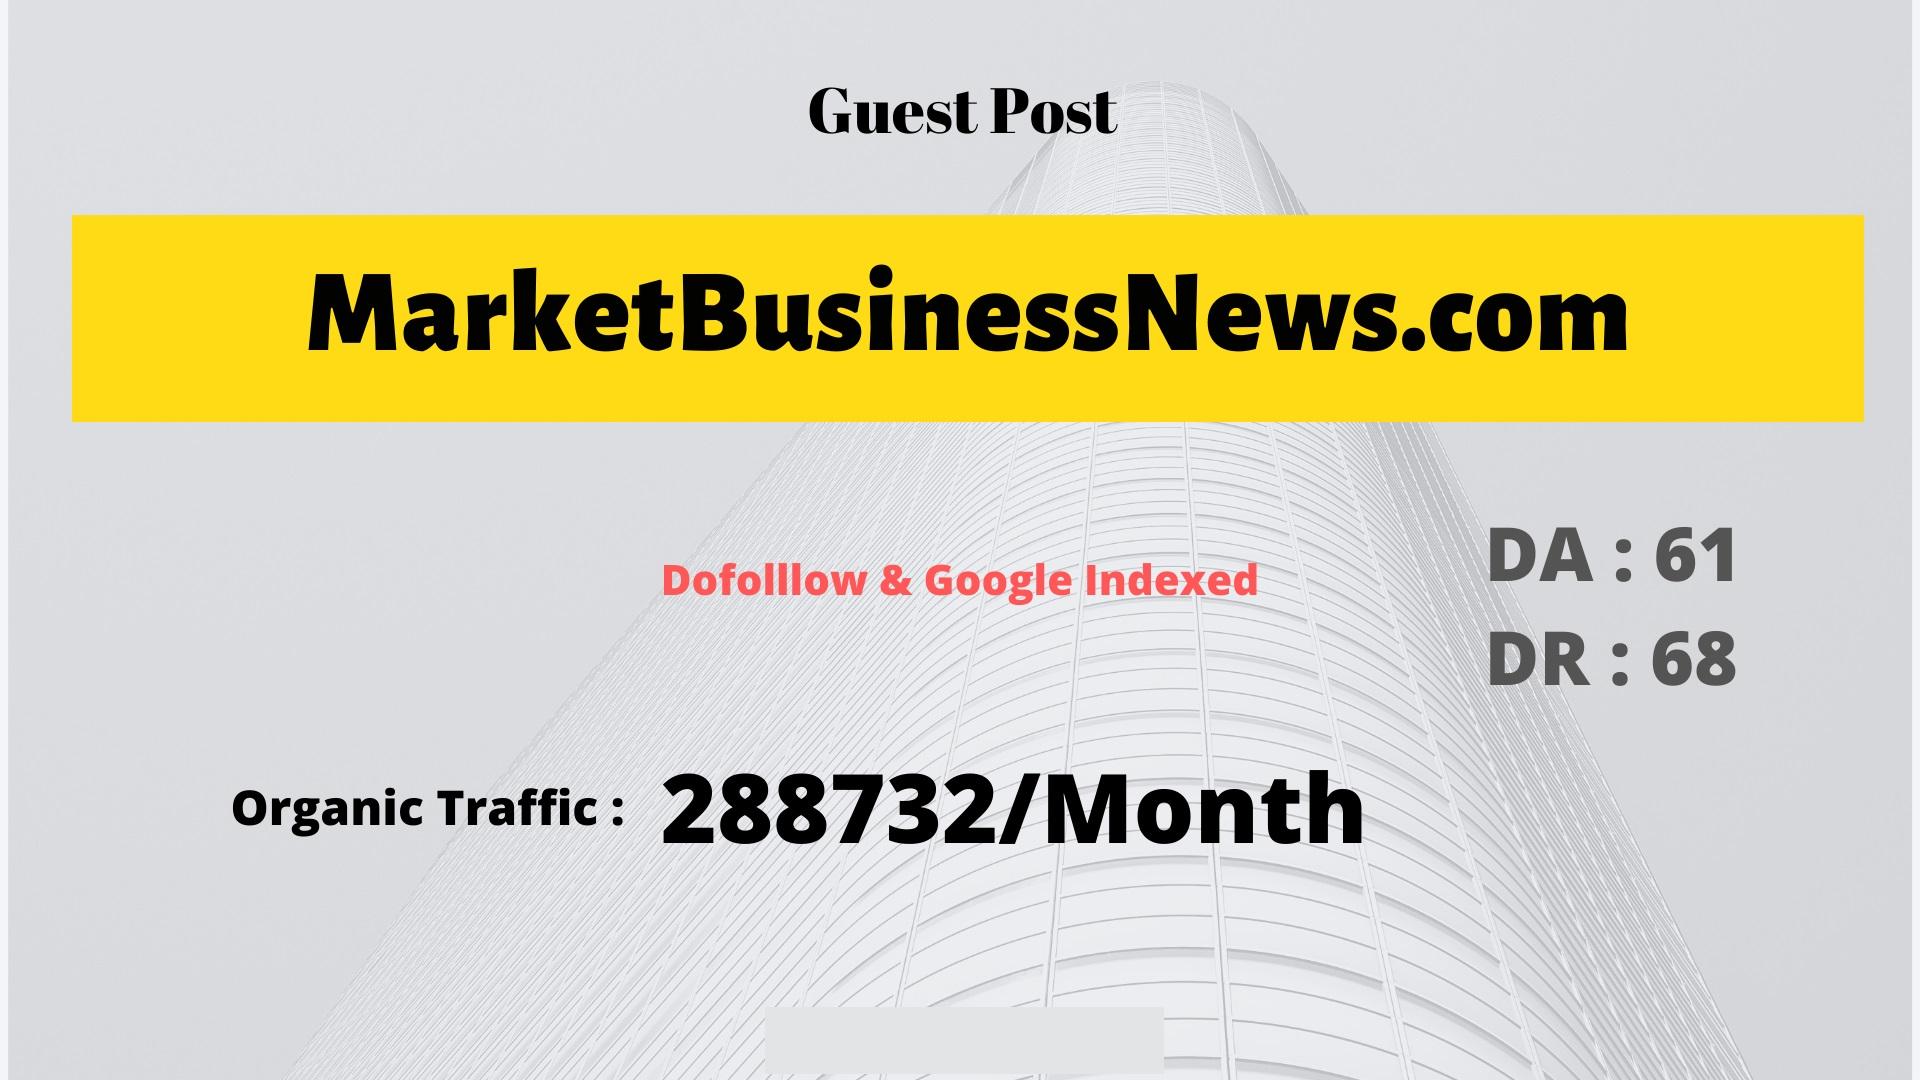 Marketbusinessnews. com Traffic 288K/month Business guest post